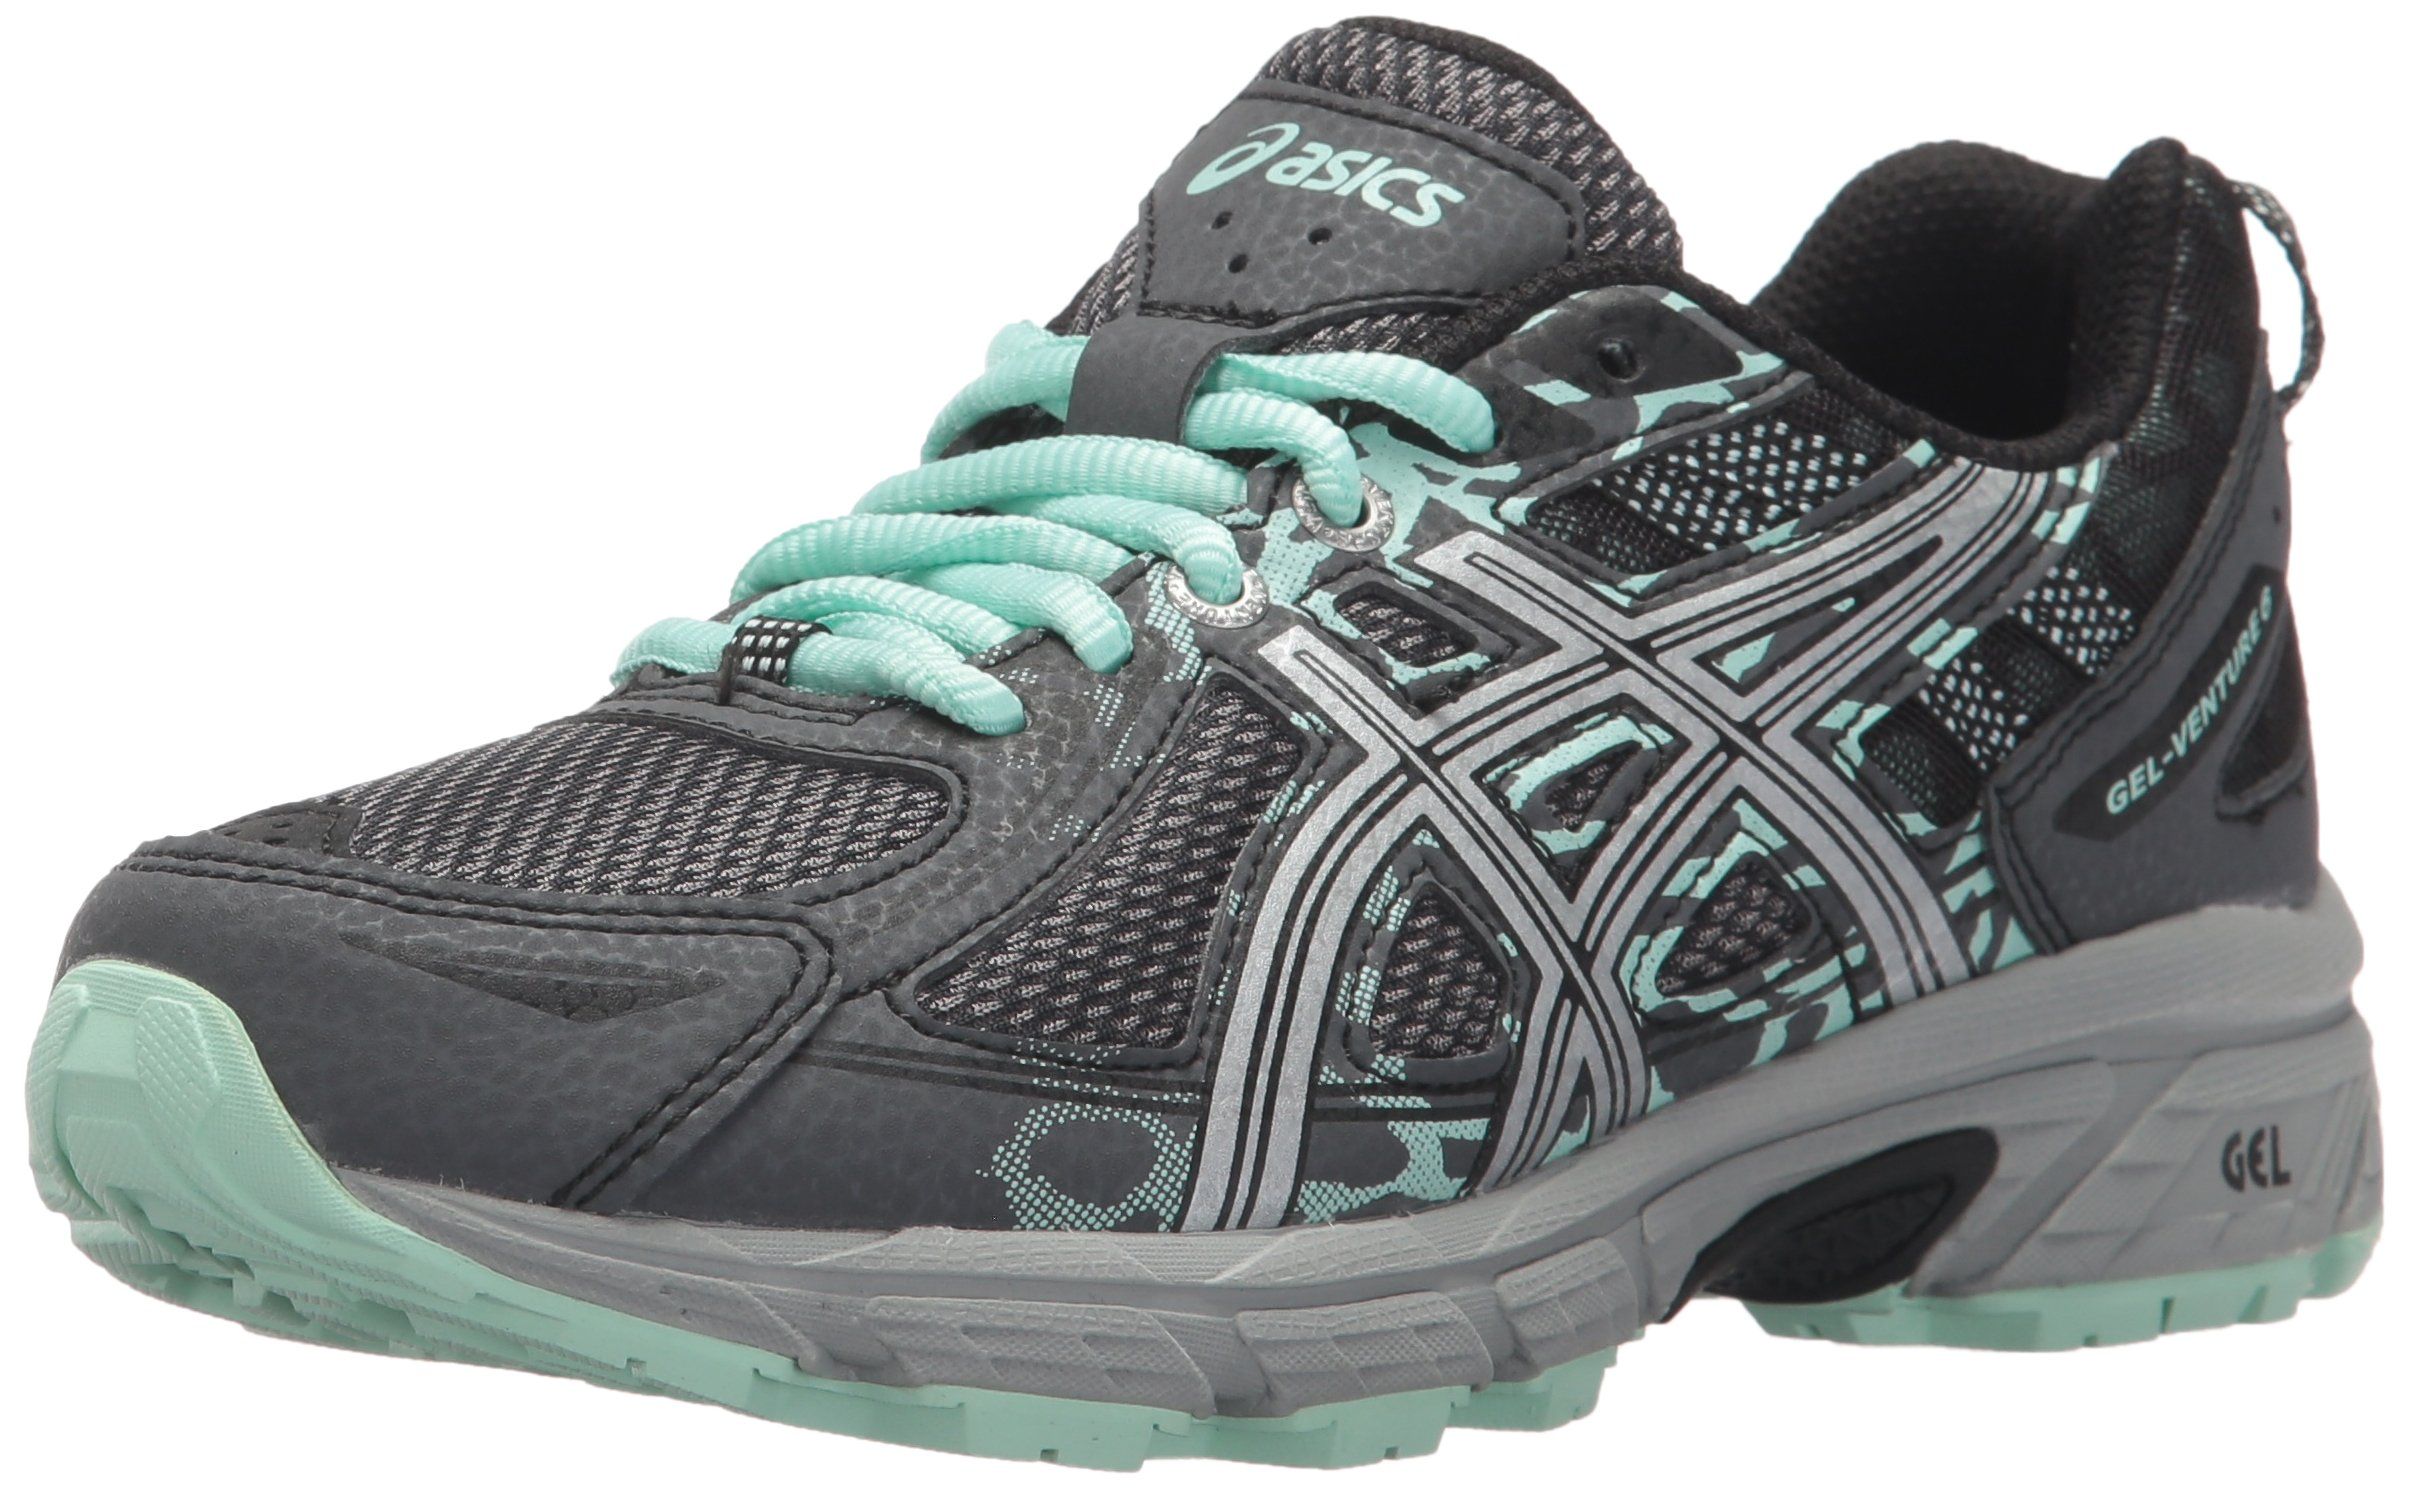 ASICS Women's Gel-Venture 6 Running-Shoes,Castlerock/Silver/Honeydew,10 Medium US